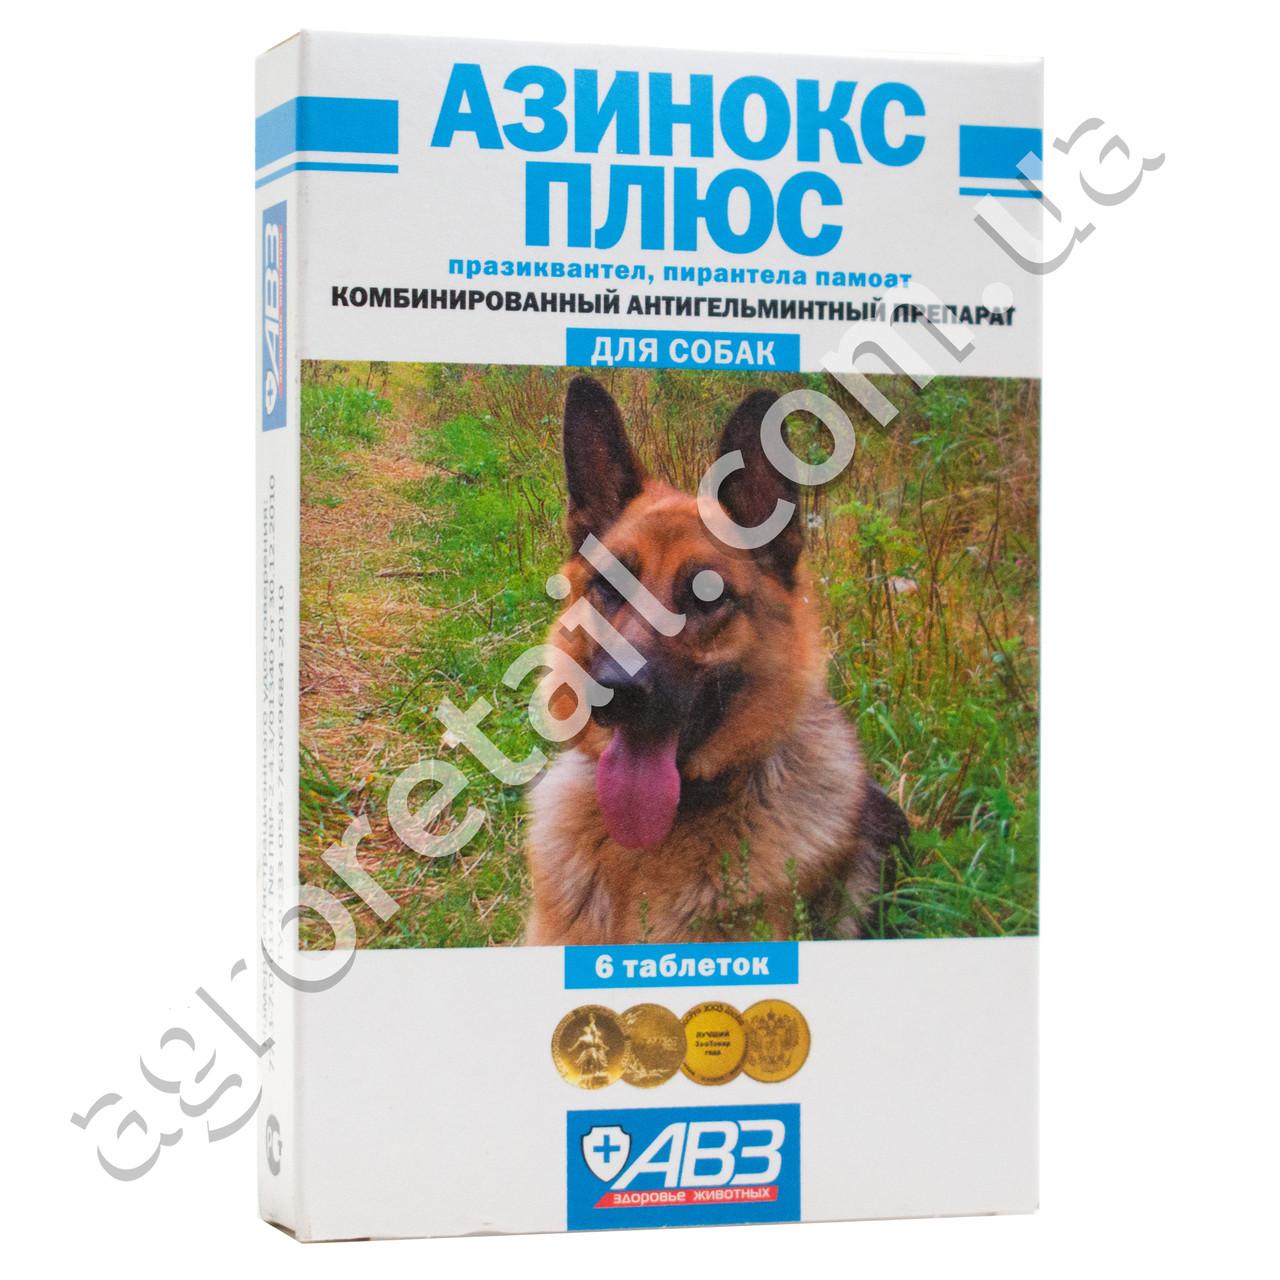 Азинокс плюс 6 таблеток